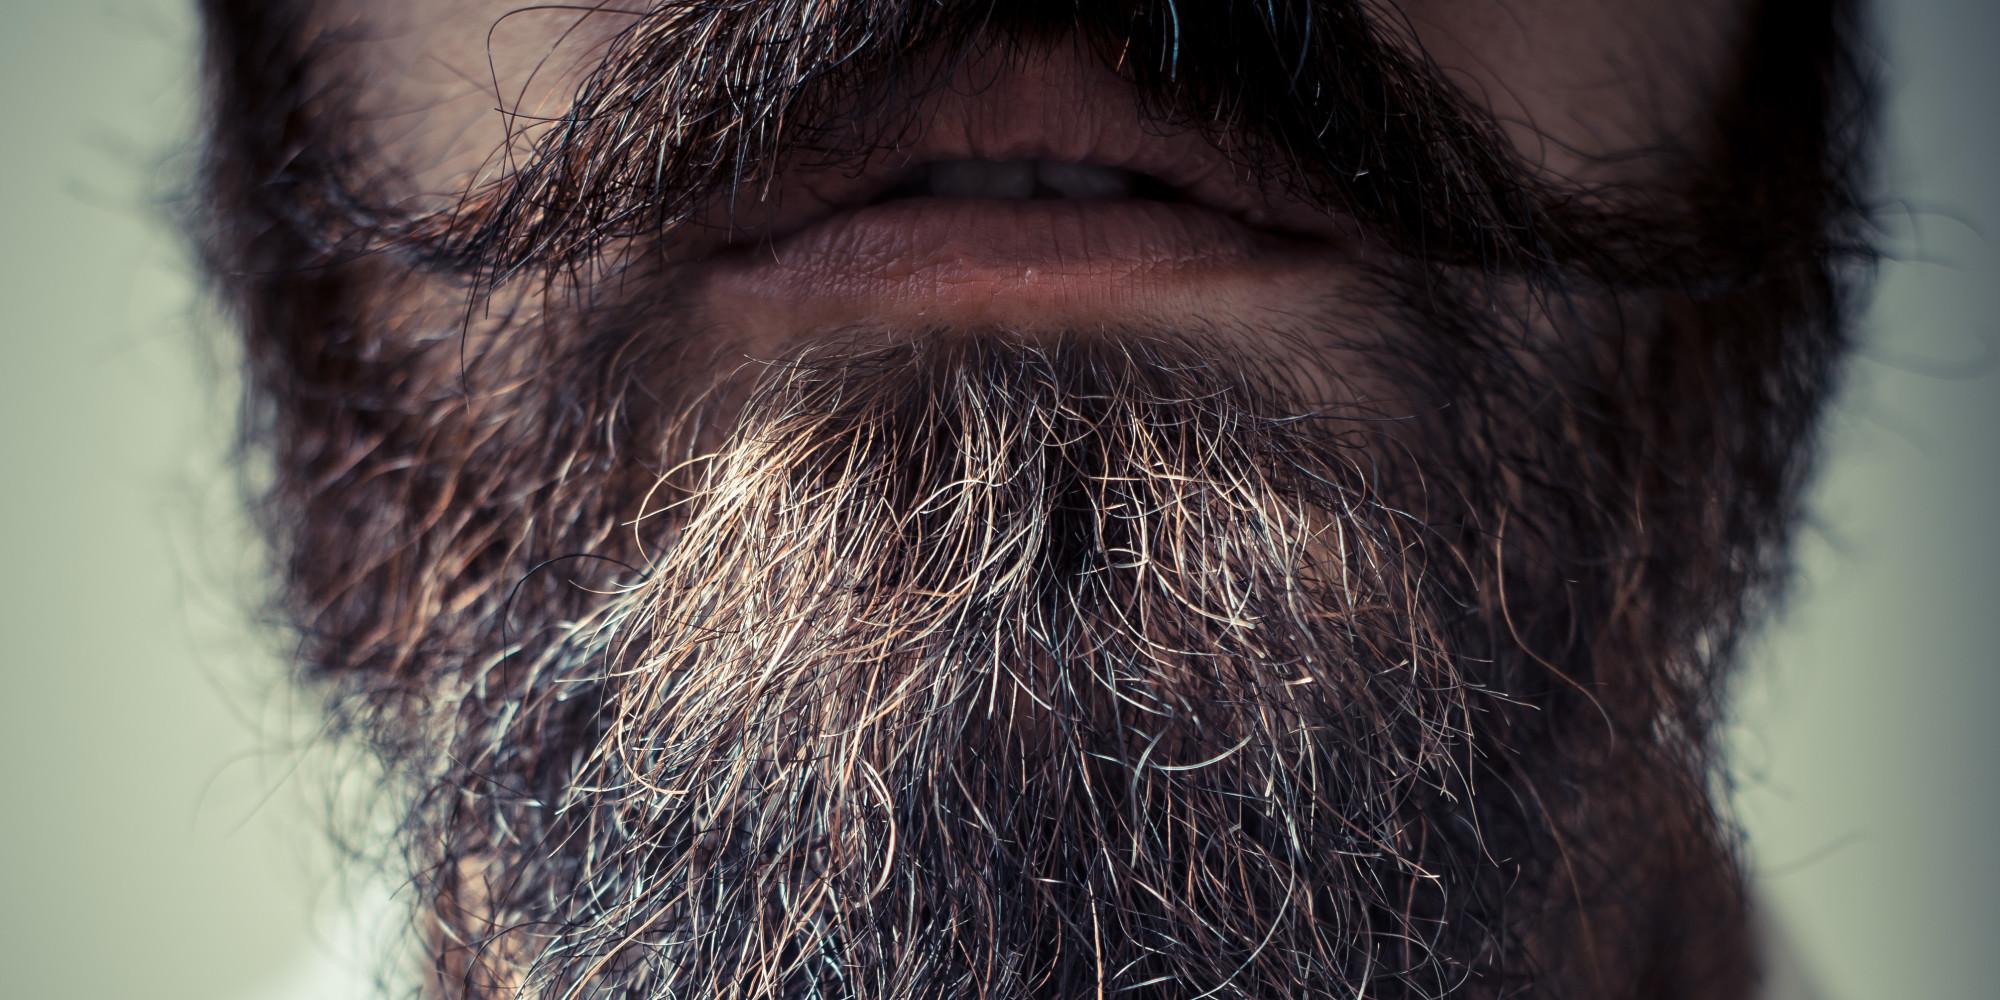 beards australia posts